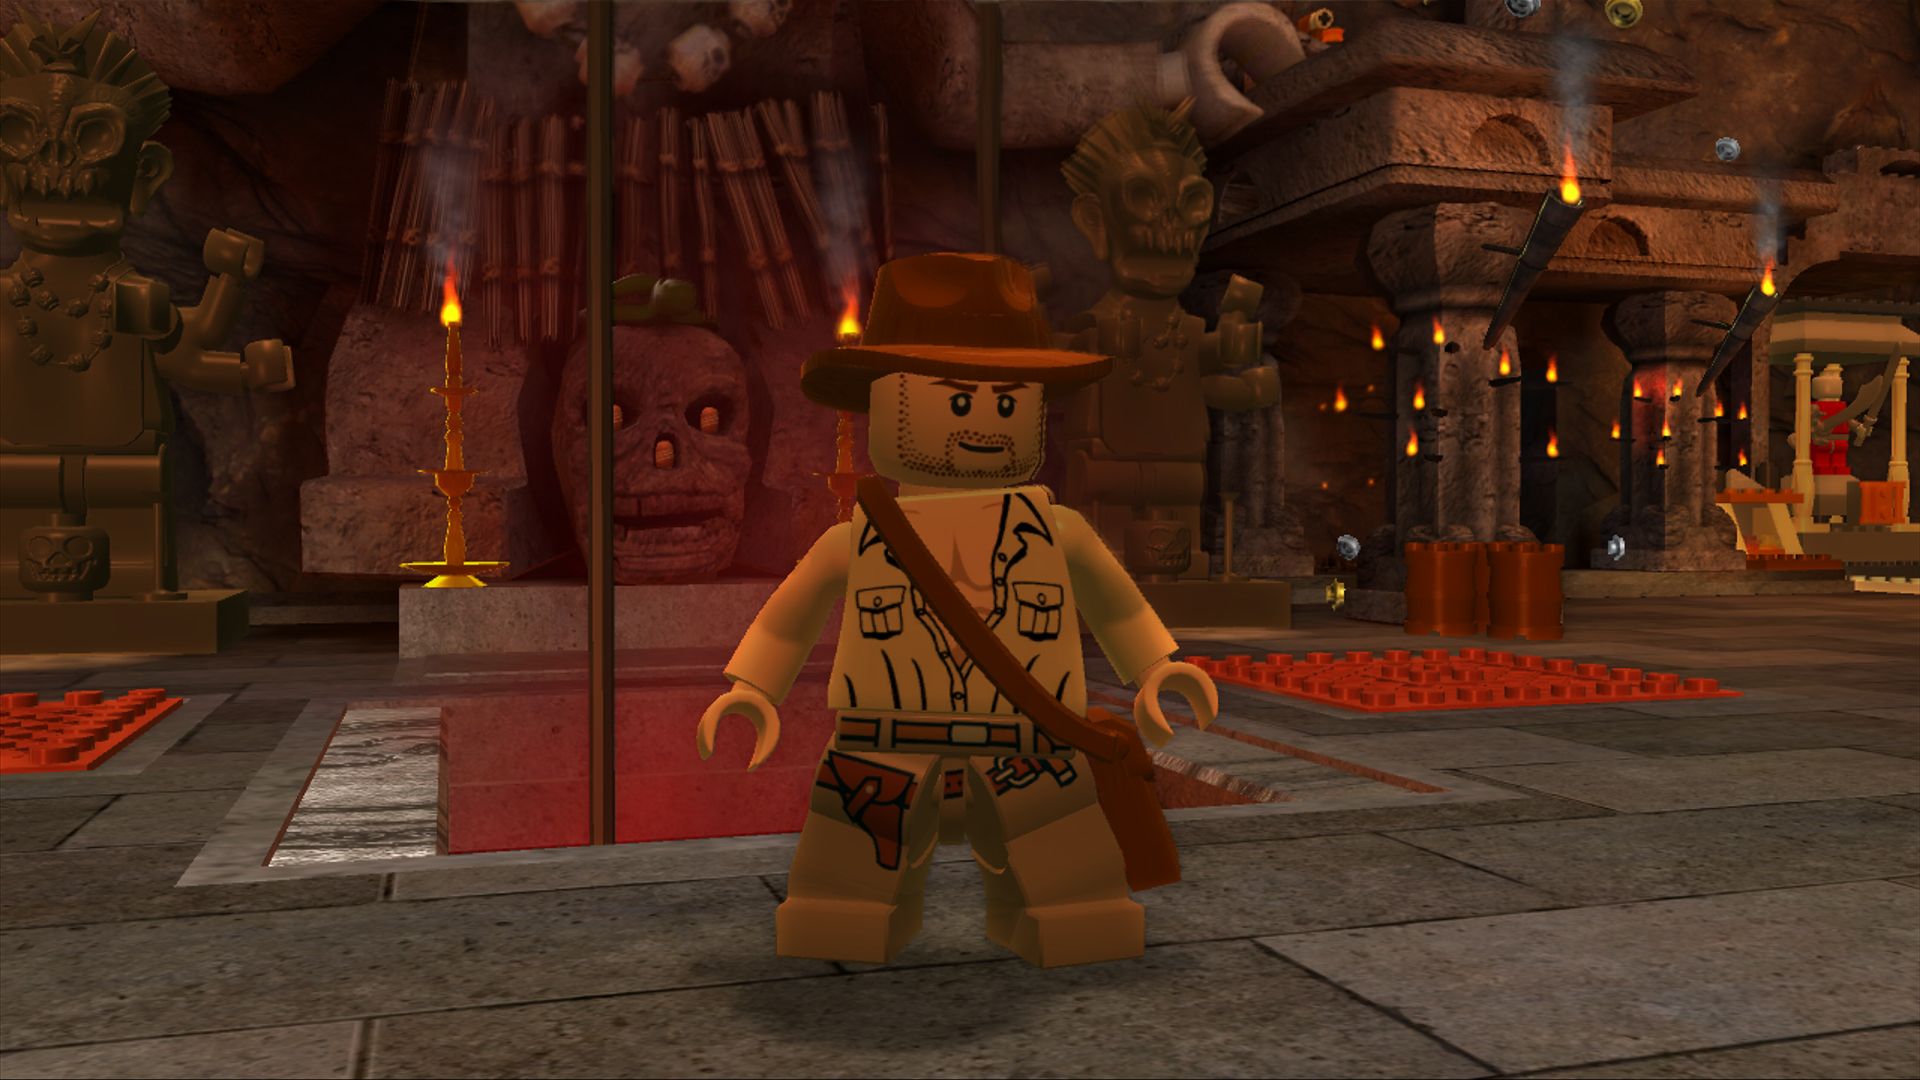 Indiana Jones and the Temple of Doom | Lego Indiana Jones